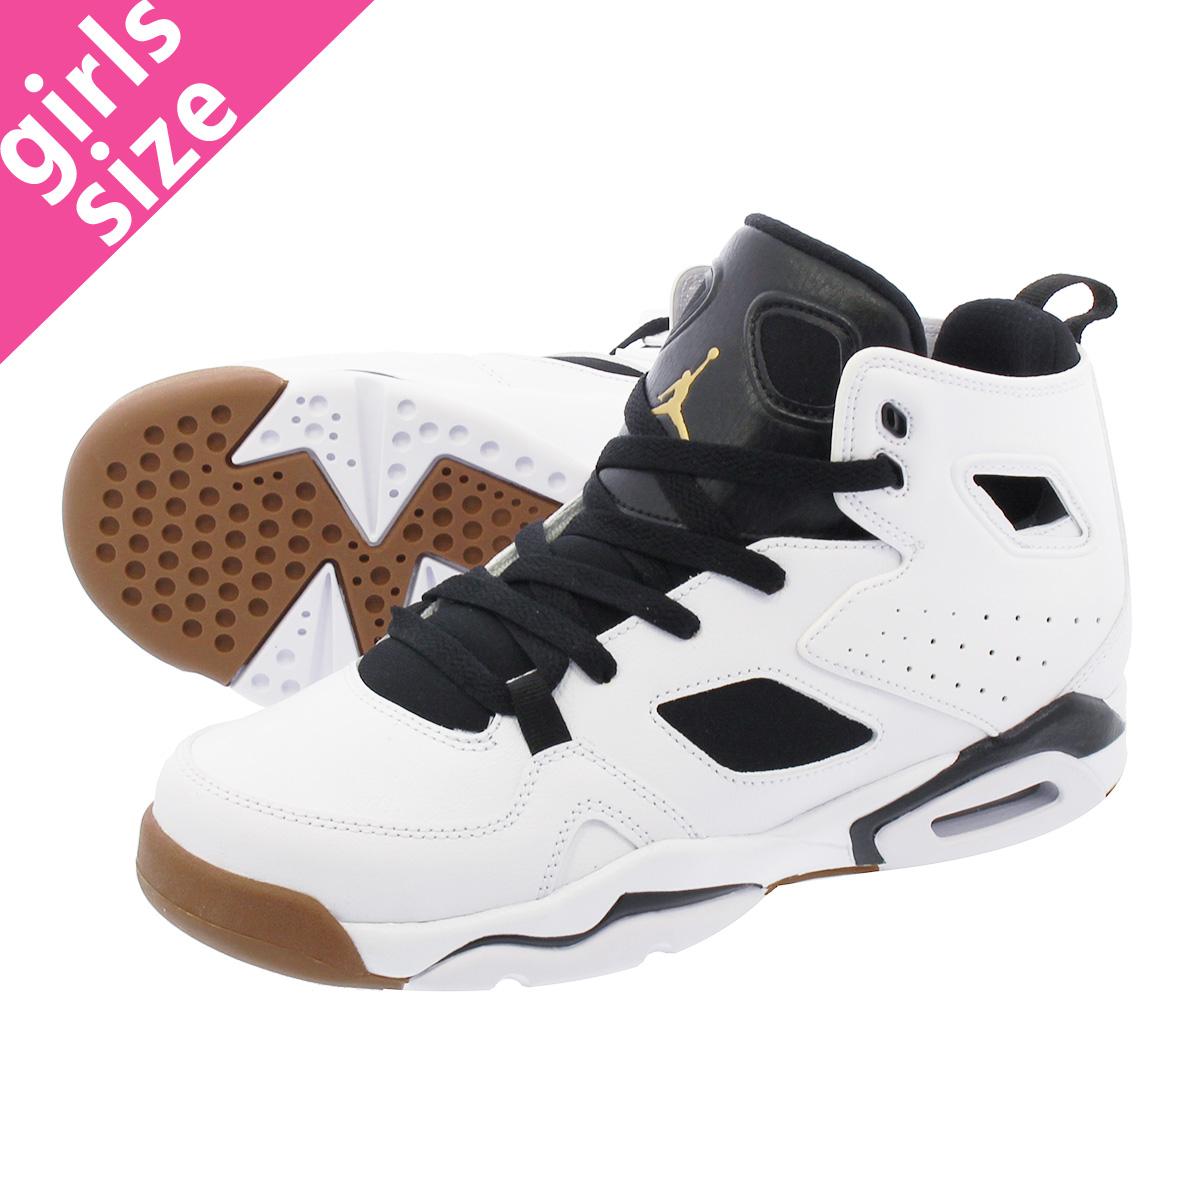 LOWTEX PLUS  NIKE JORDAN FLIGHT CLUB 91 GG Nike Jordan flight club 91 GG  WHITE BLACK GOLD 555 5b8cd626f1